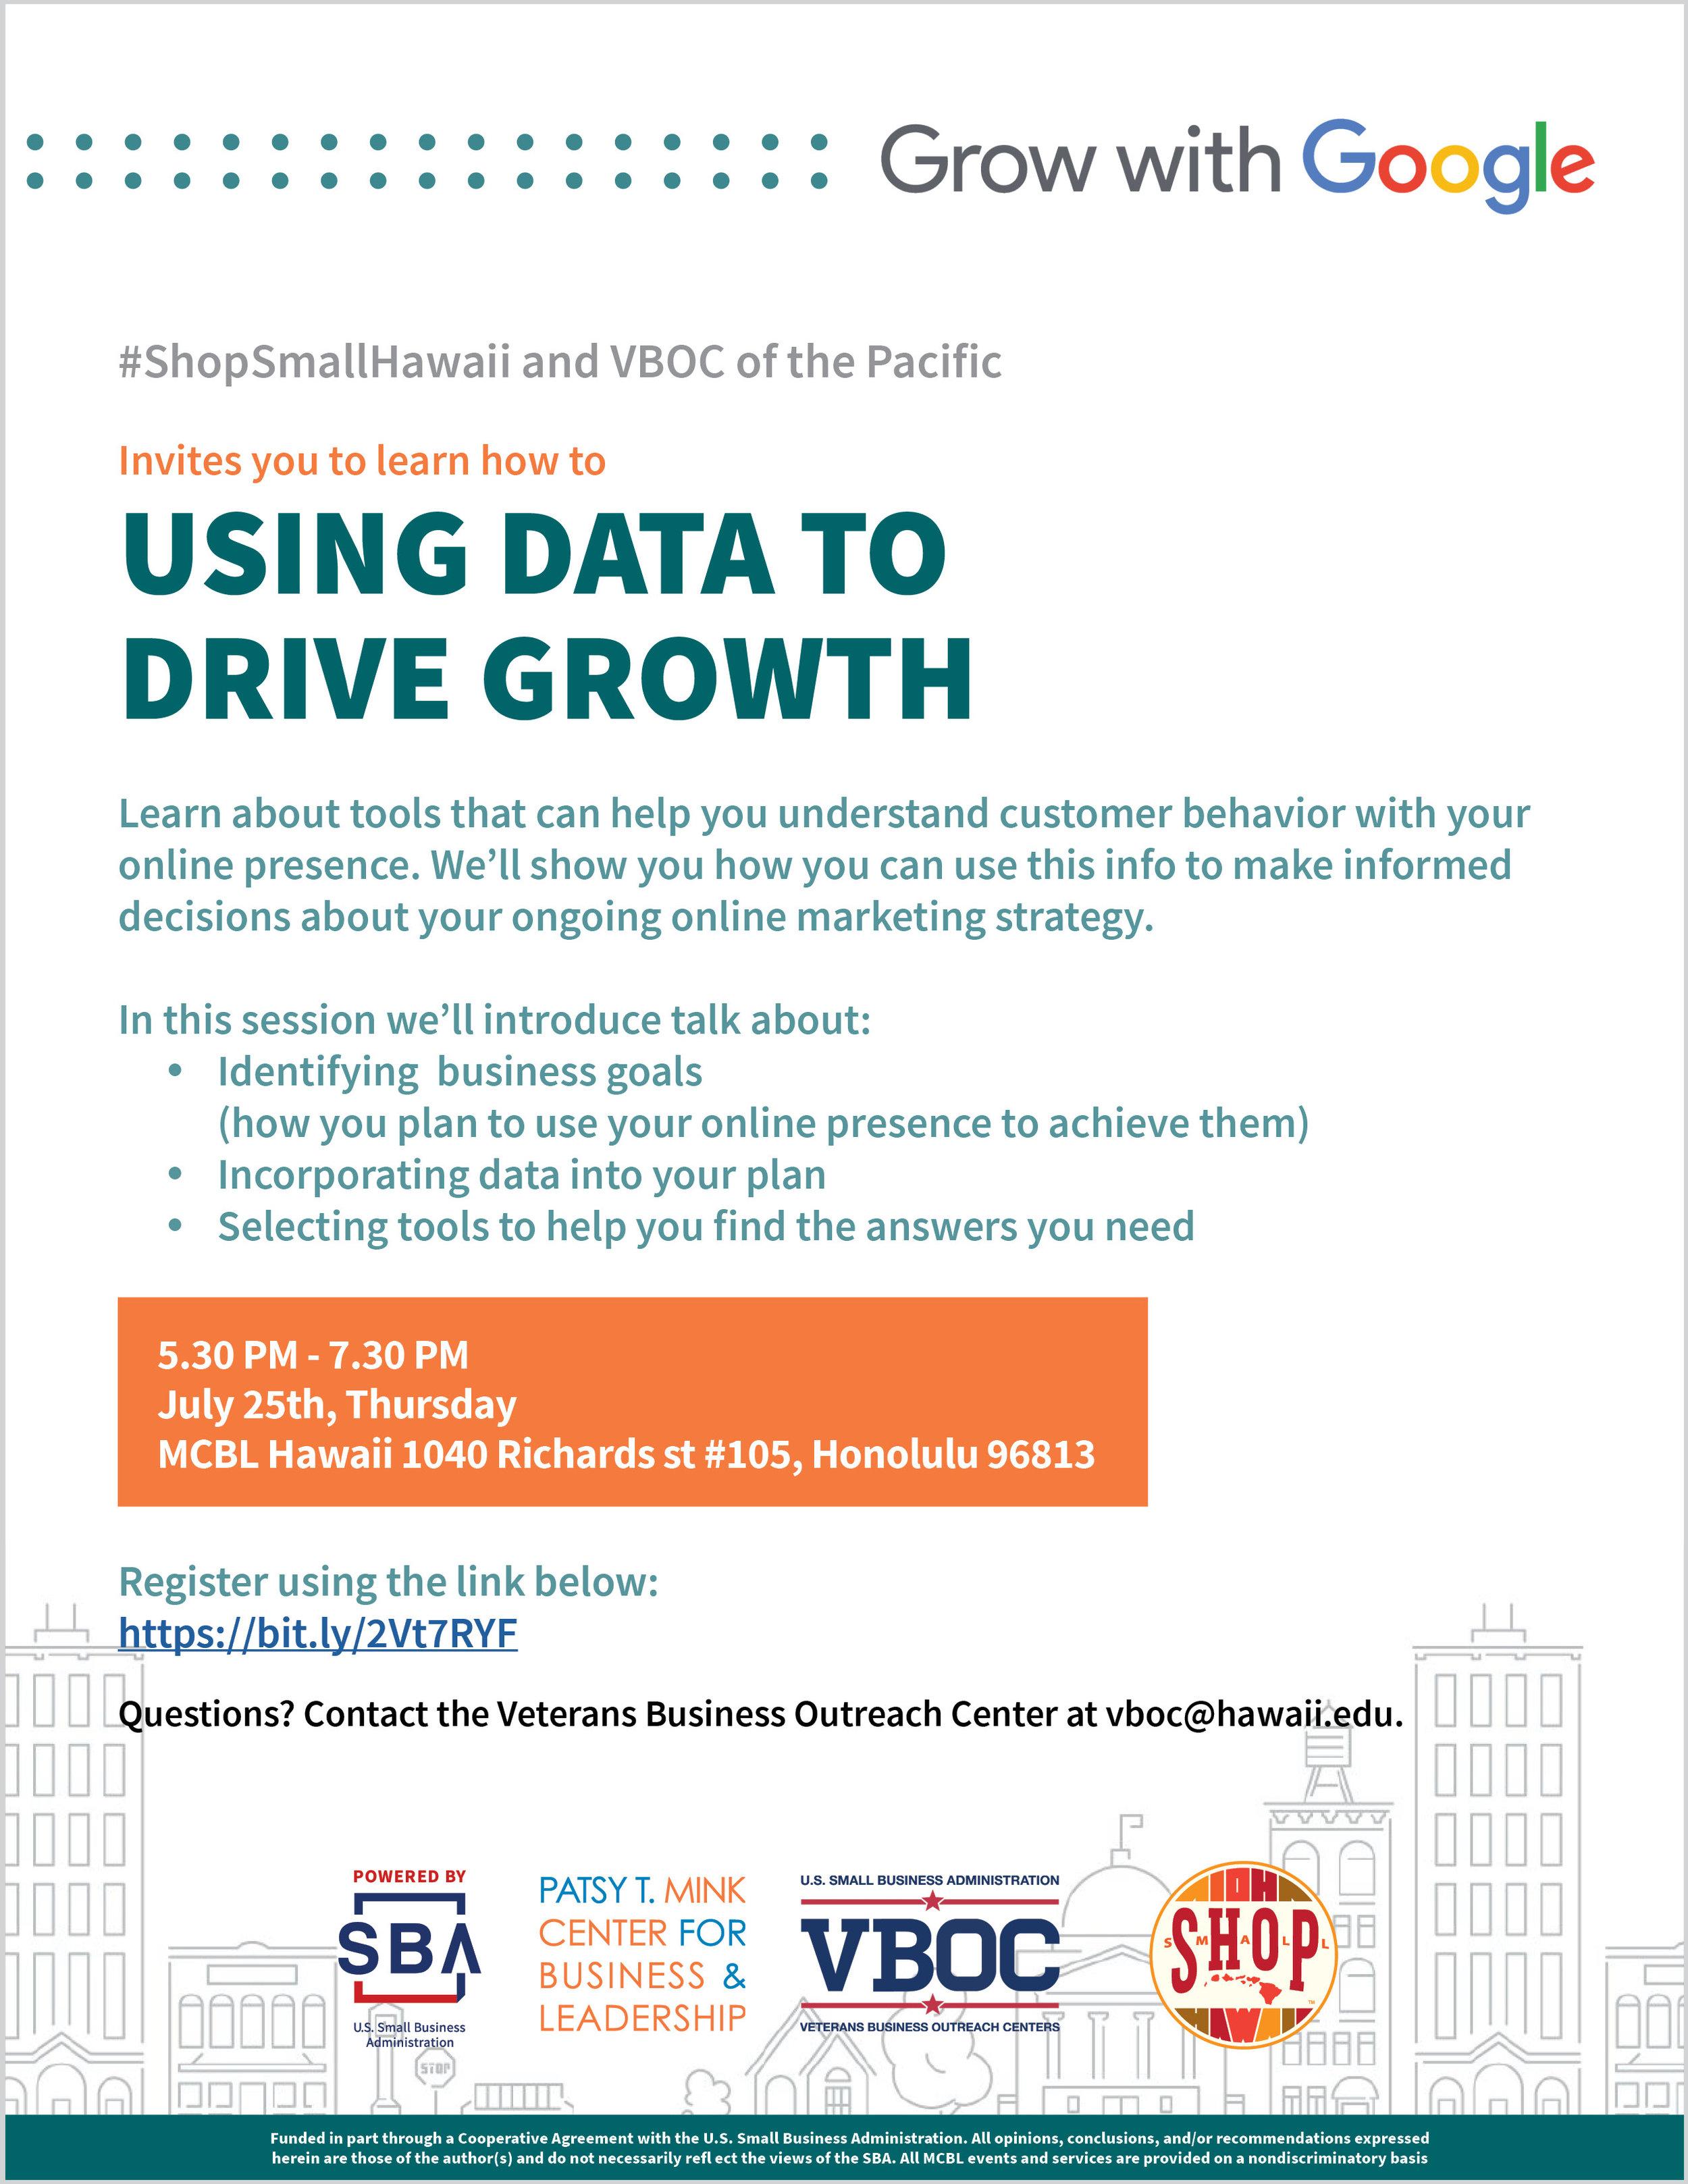 Google Workshop Flyer - Using Data to Drive Growth.jpg